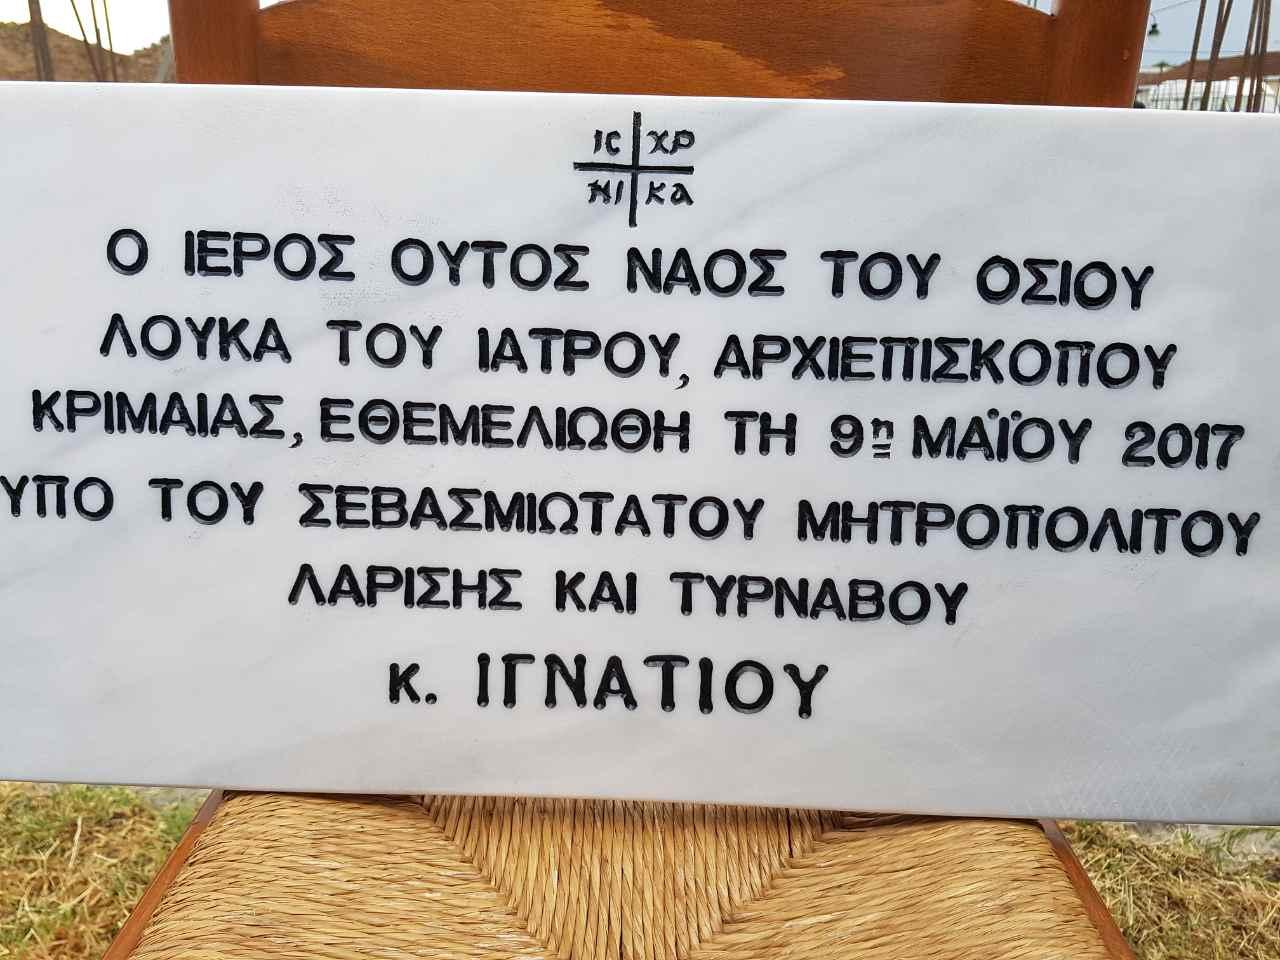 themeliwsi_aglouka_ampelwna-7